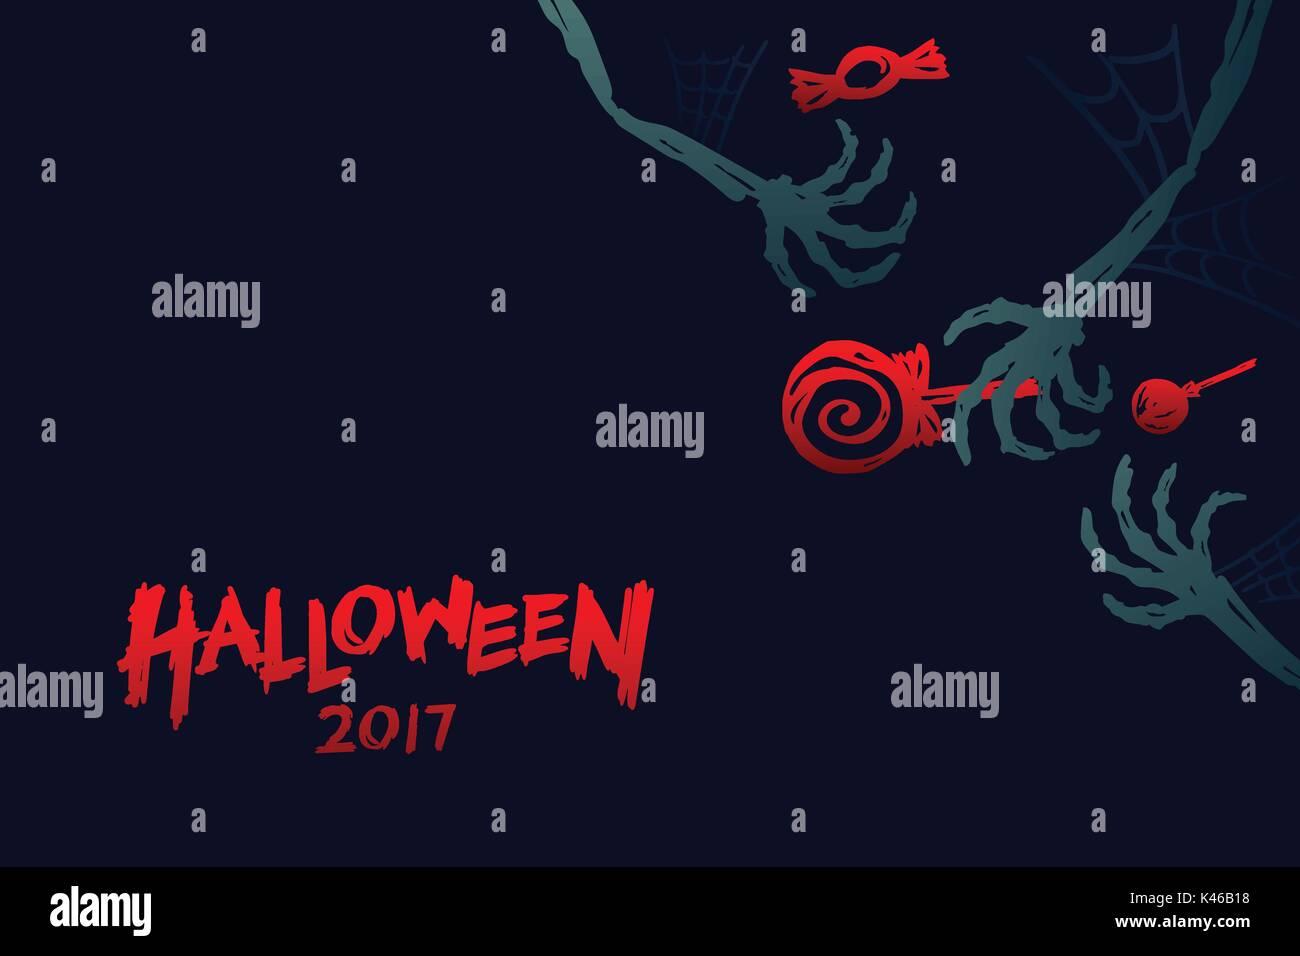 Halloween 2017 conjunto de plantillas de fondo, esqueleto monster ...